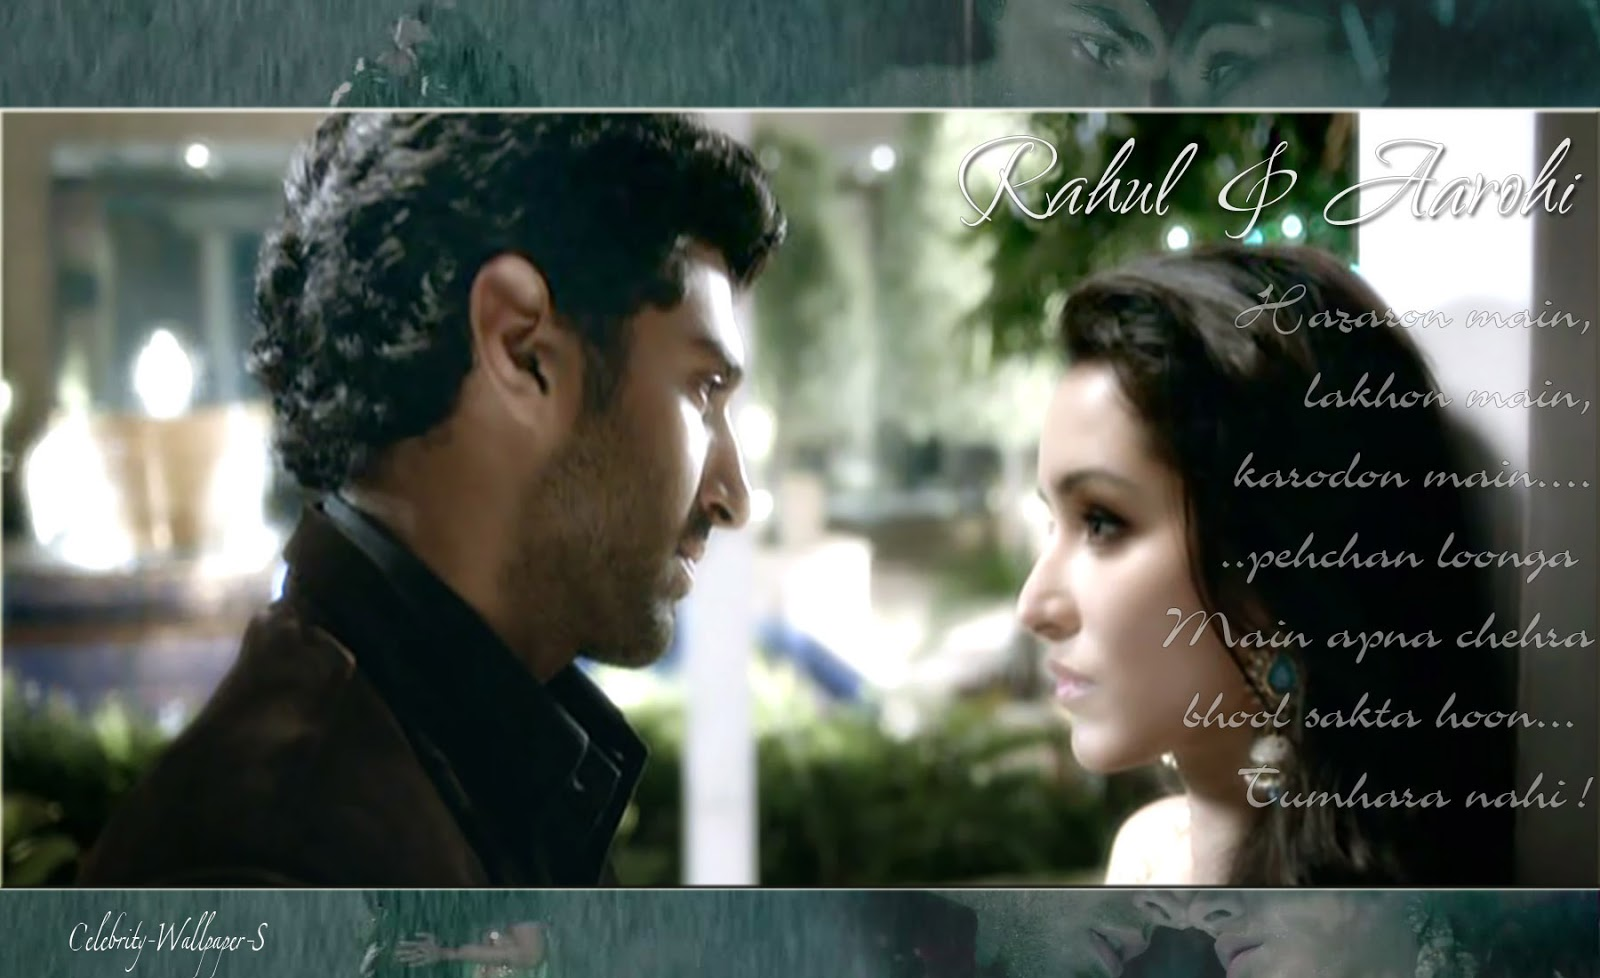 Fantastic Wallpaper Movie Aashiqui 2 - Aashiqui+2+Wallpaper+HD+Rahul+Aarohi+%25281%2529  Trends_8214.jpg